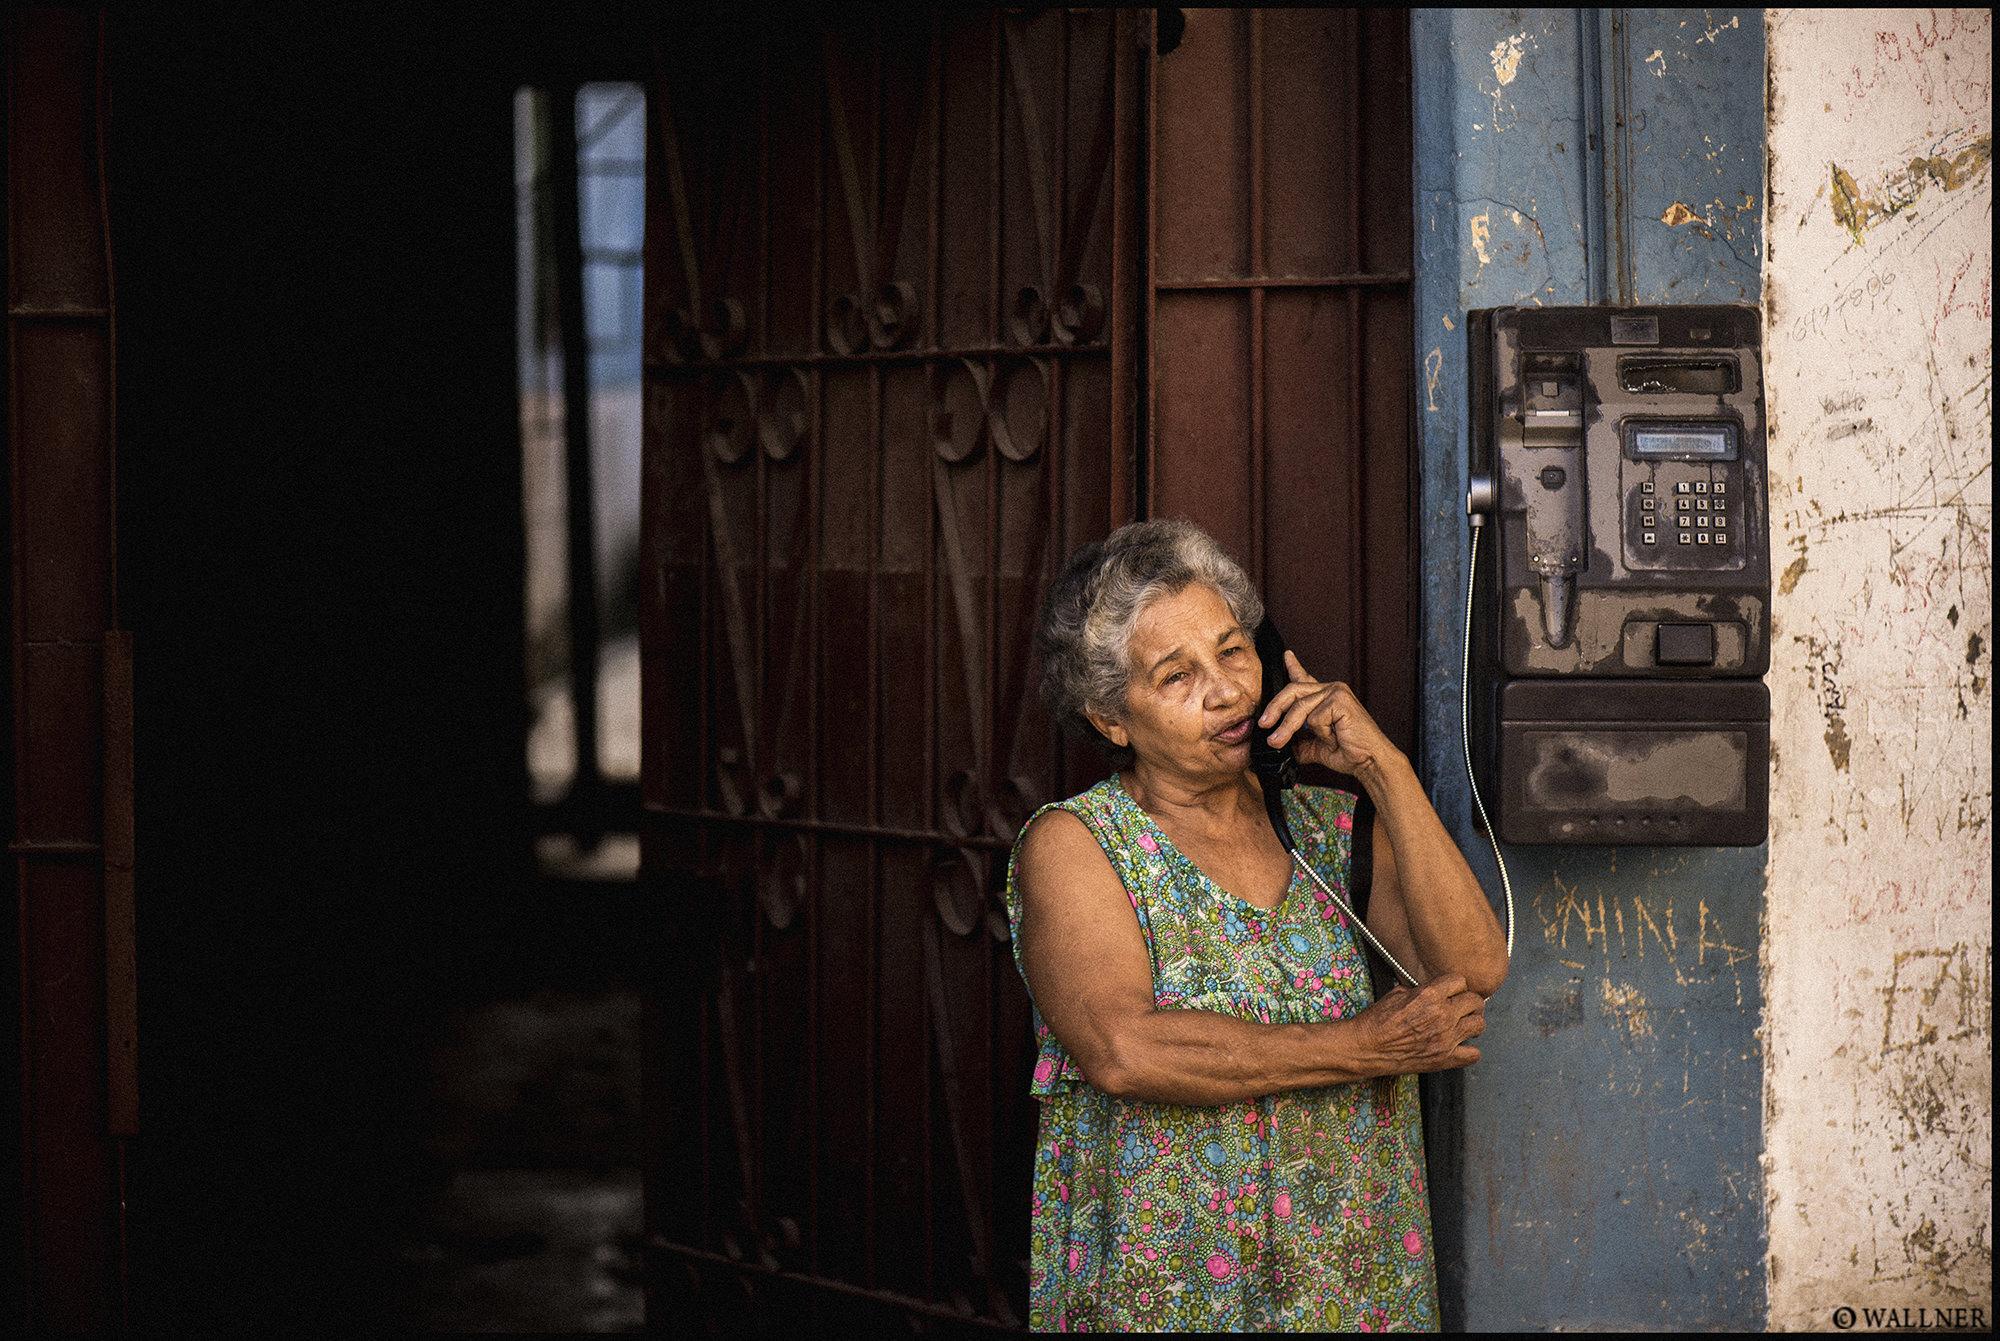 Digital Patrik Wallner Havana The Call LOWQ 2000P w WM